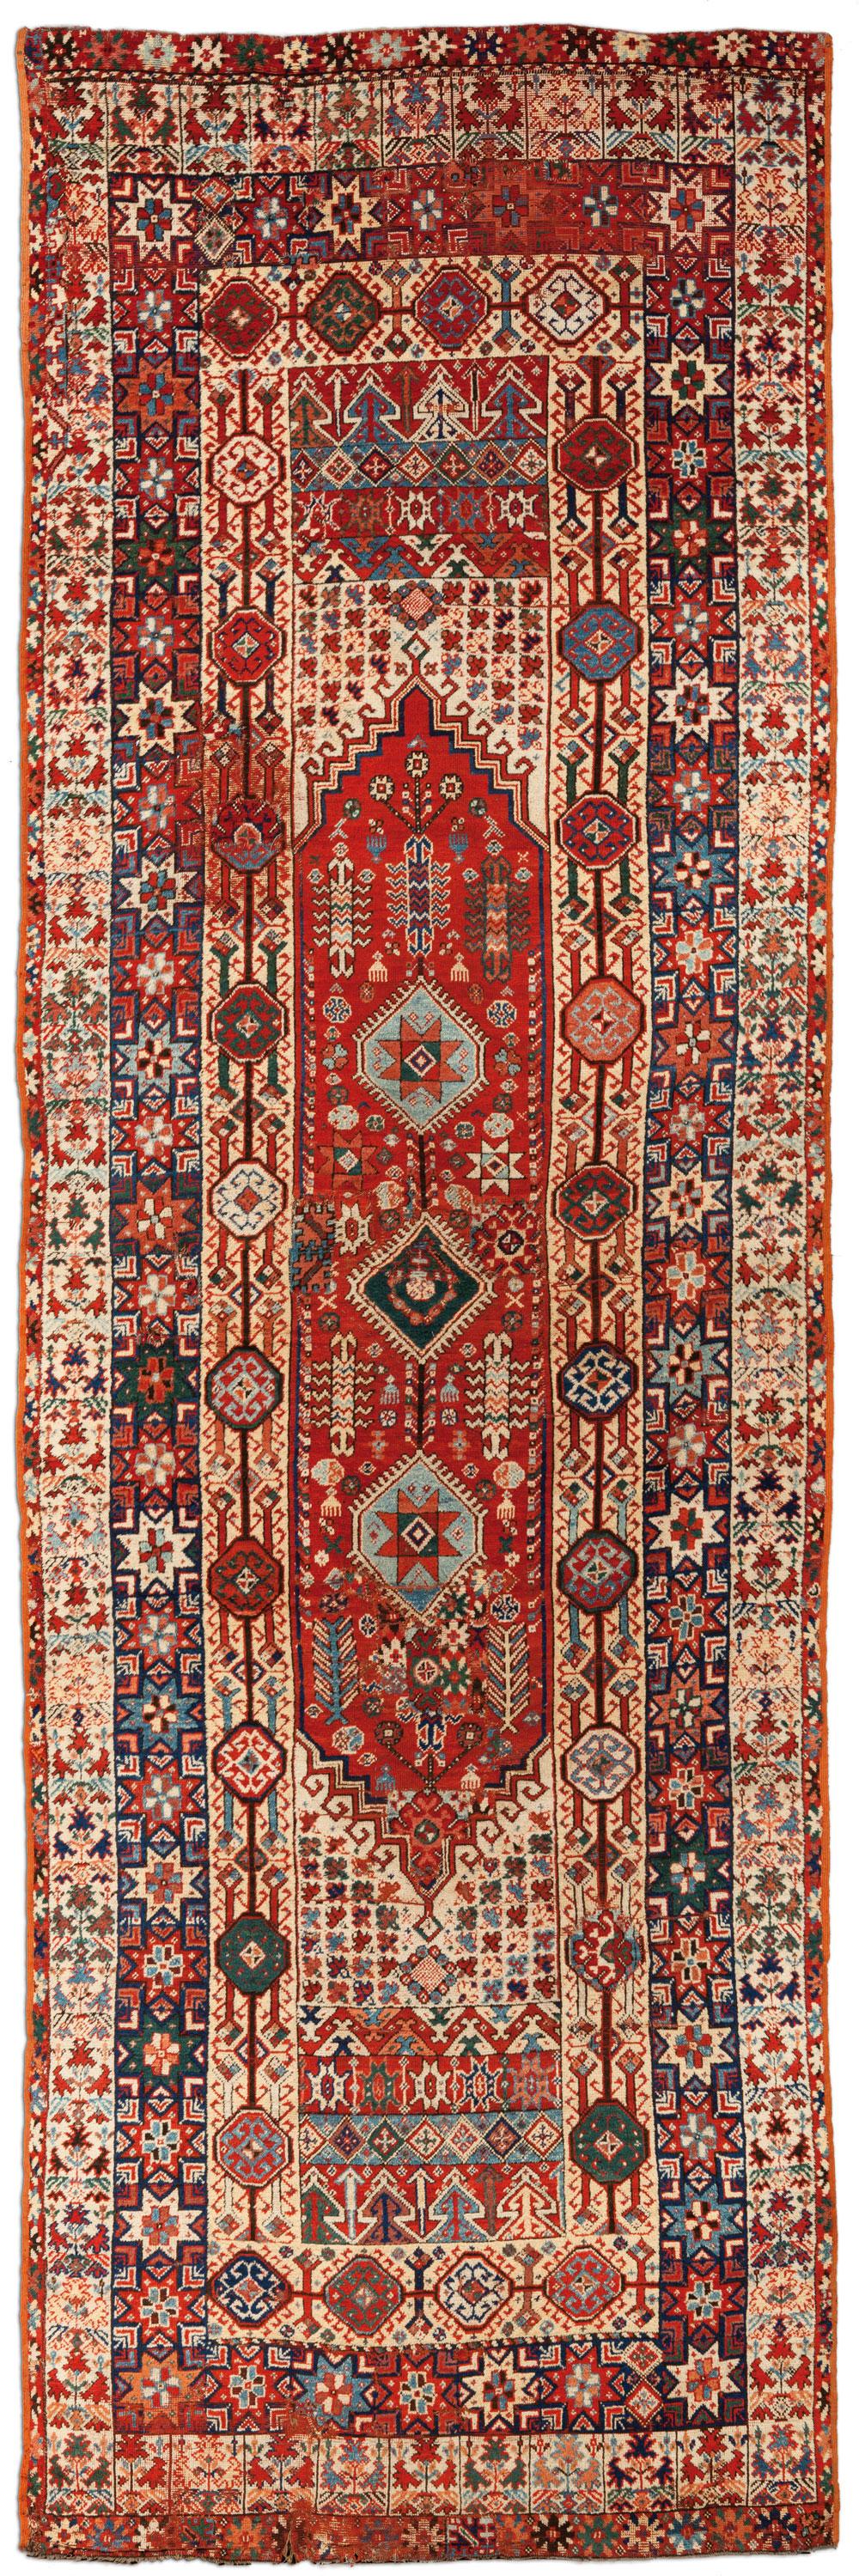 Lot 296 Rabat pile carpet